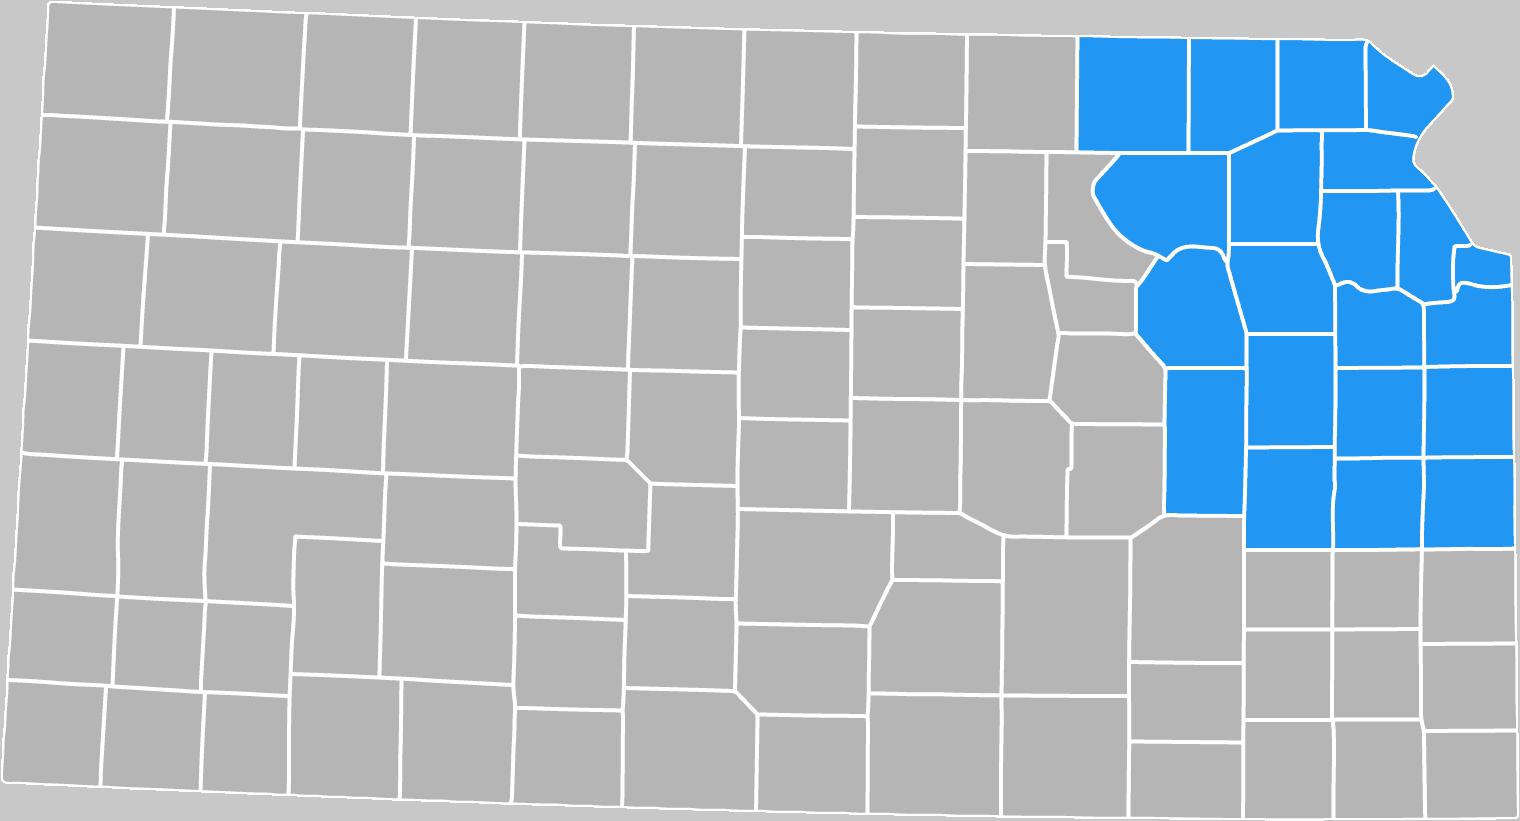 Catholic Charities service area map - 21 counties of northeast Kansas